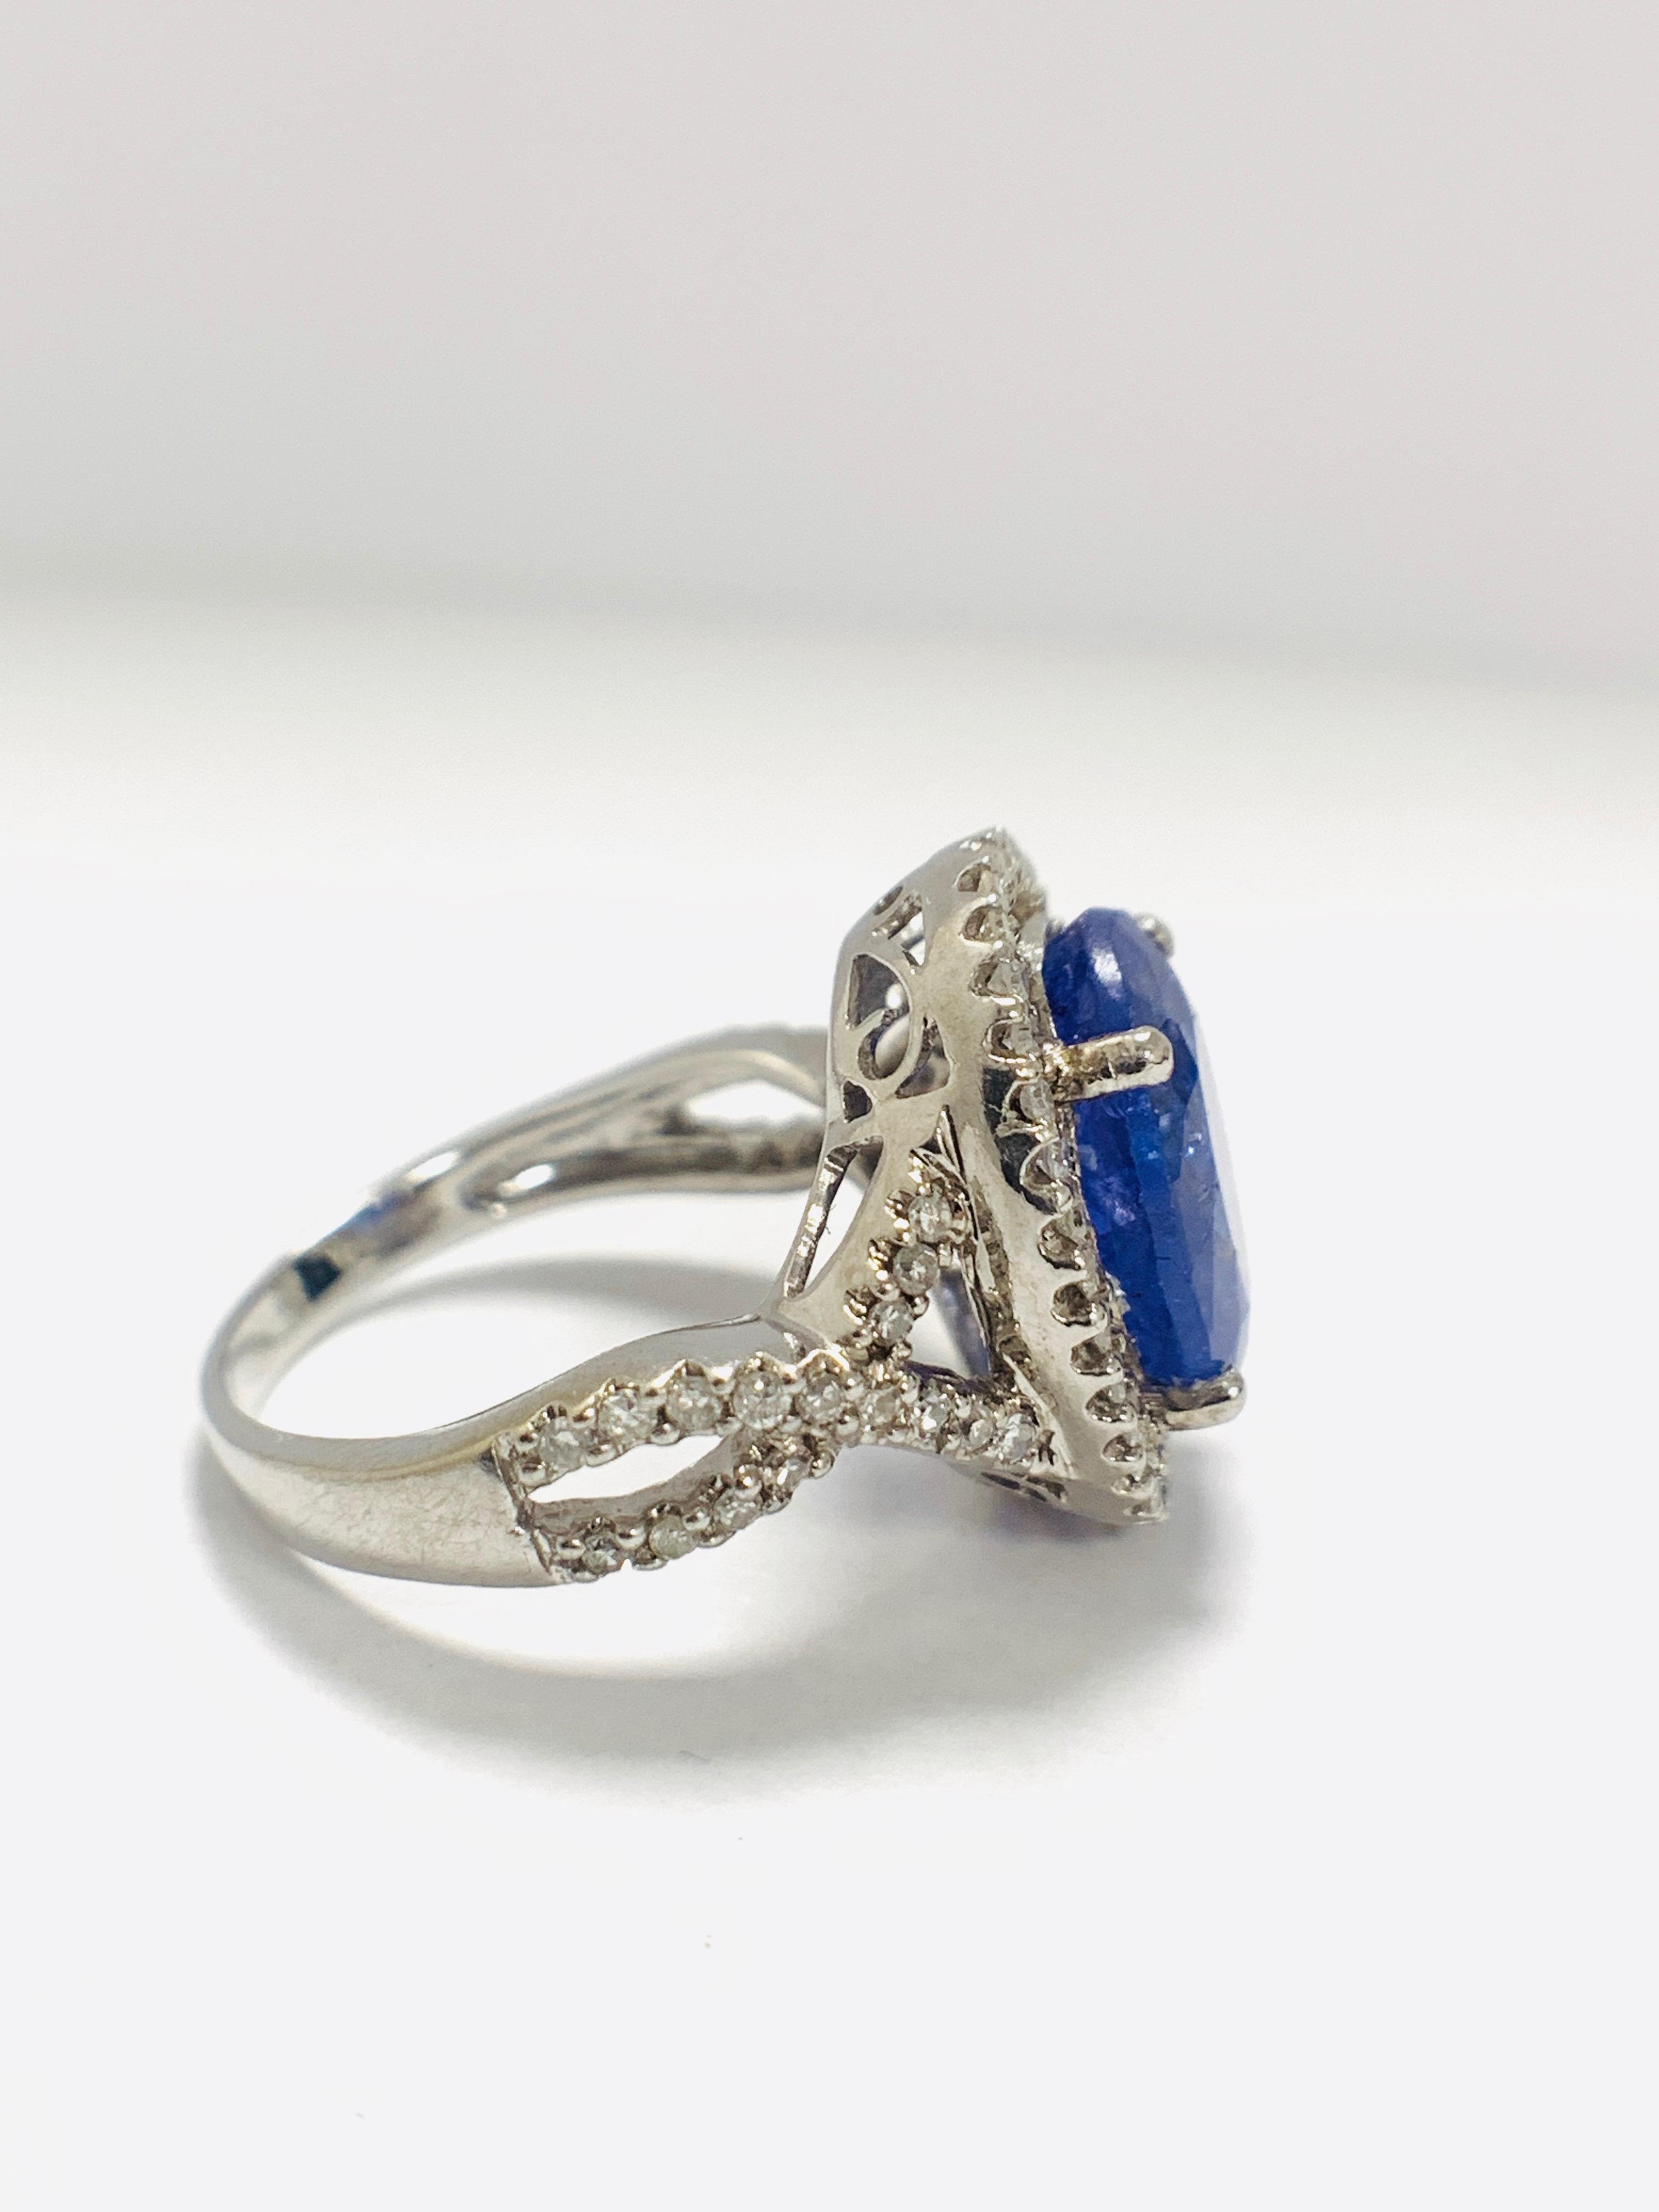 18ct White Gold Tanzanite and Diamond ring - Image 6 of 15